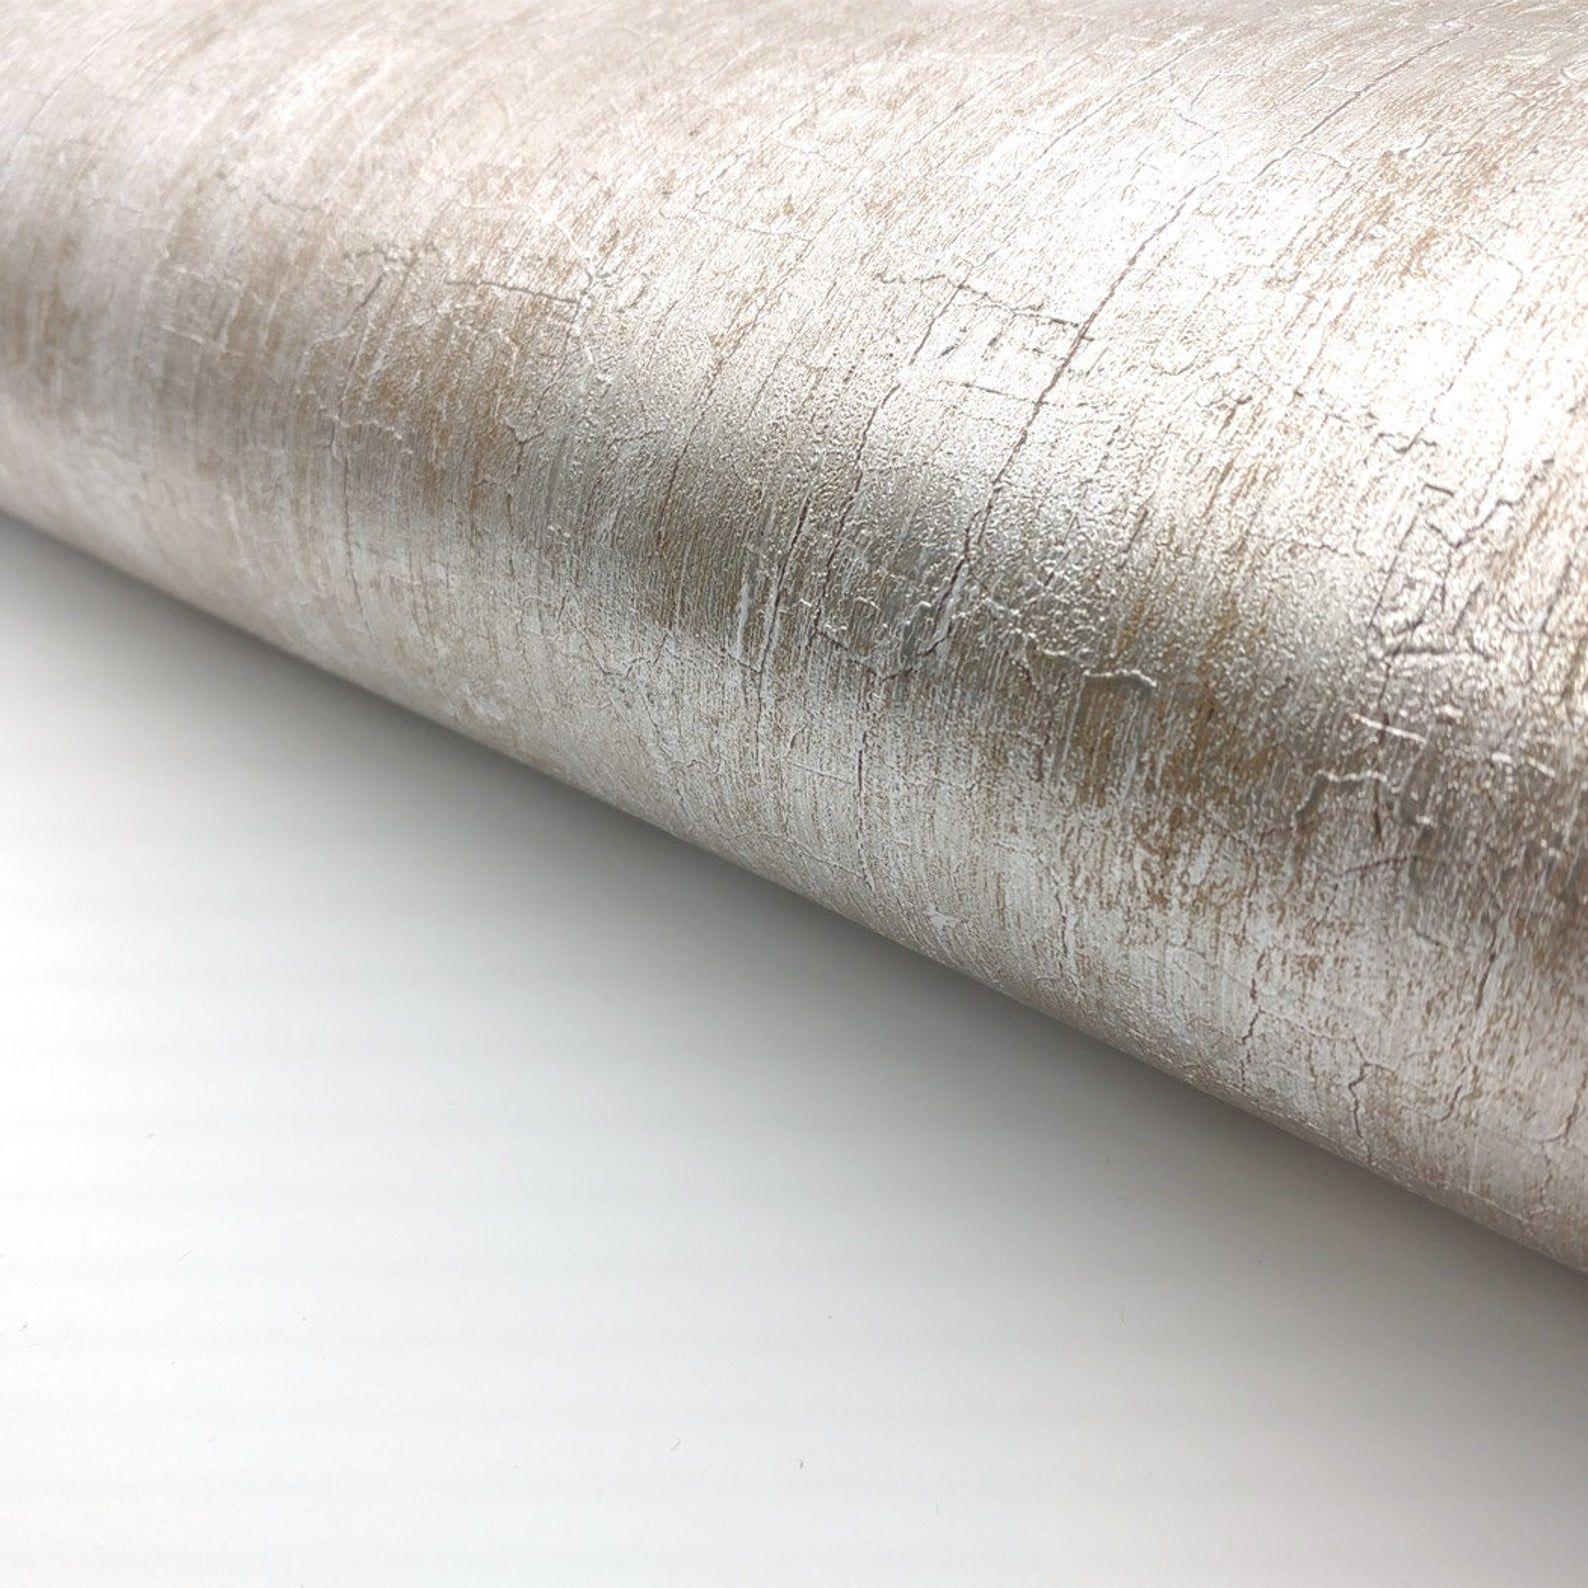 Silver Metallic Glitter Shinny Peel And Stick Wallpaper Etsy Peel And Stick Wallpaper Metallic Wallpaper Textured Wallpaper